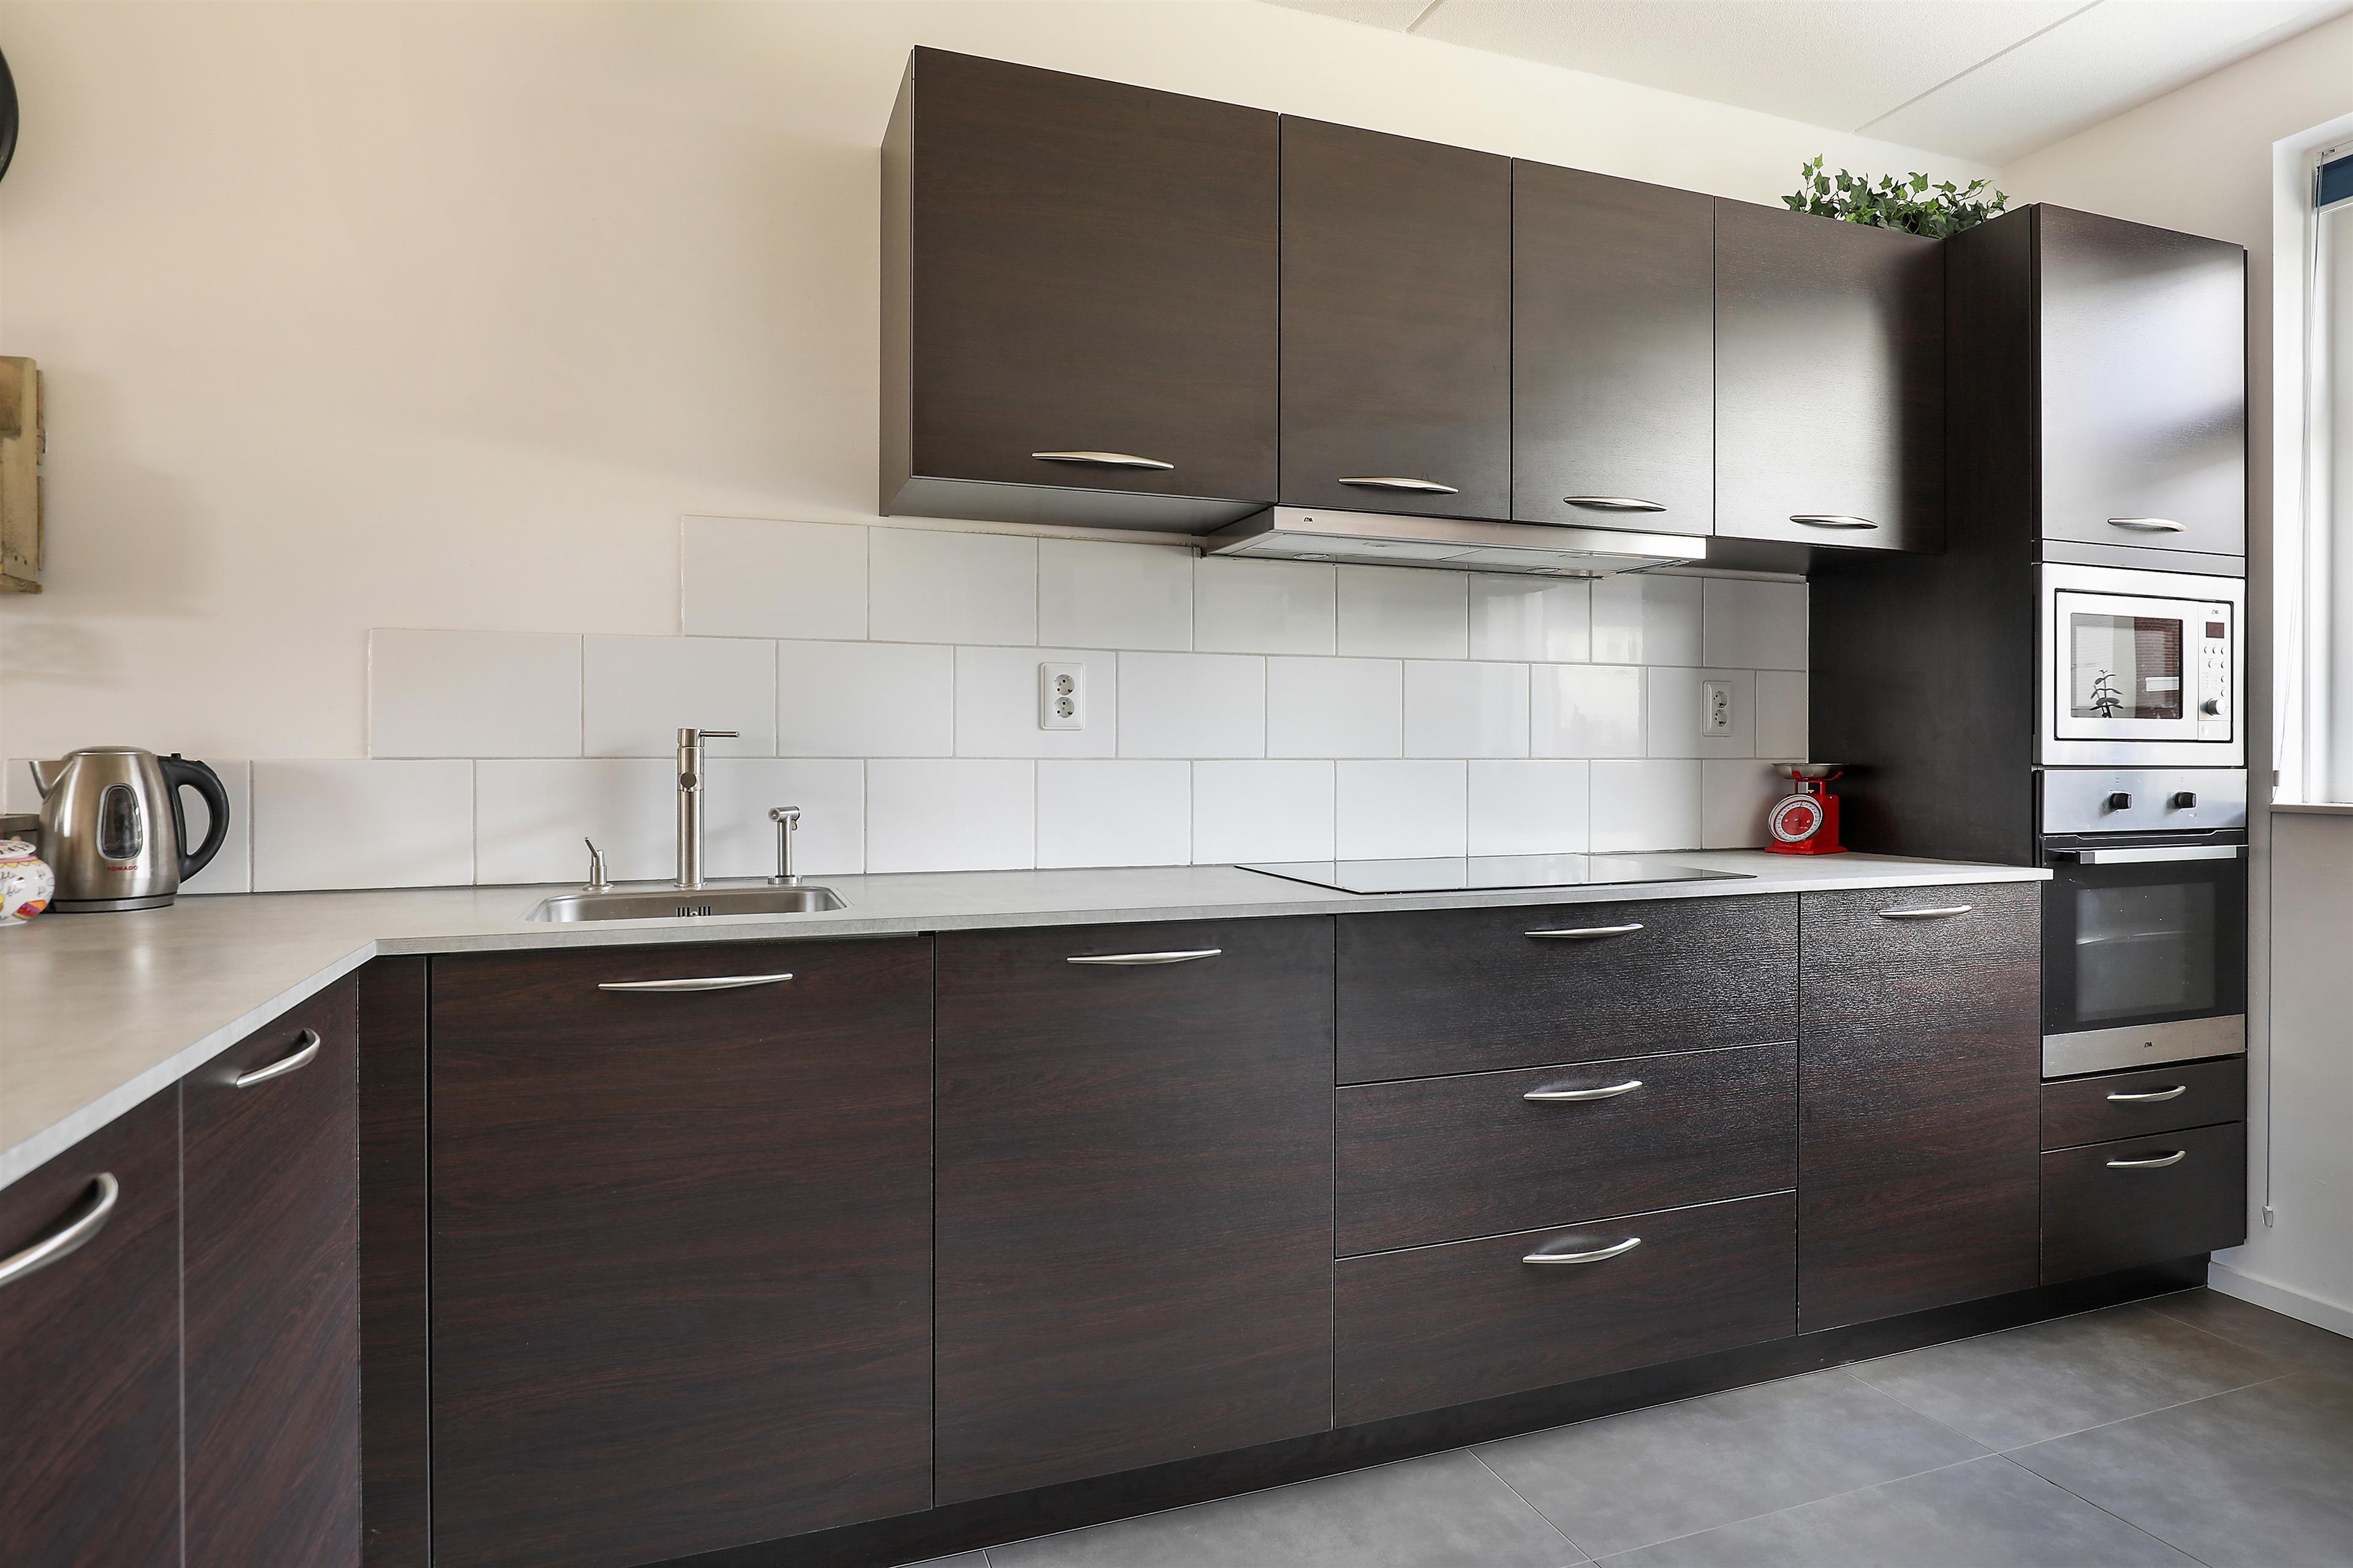 Nolte Keukens Apeldoorn : Nolte keukens apeldoorn ervaringen nolte keukens apeldoorn best